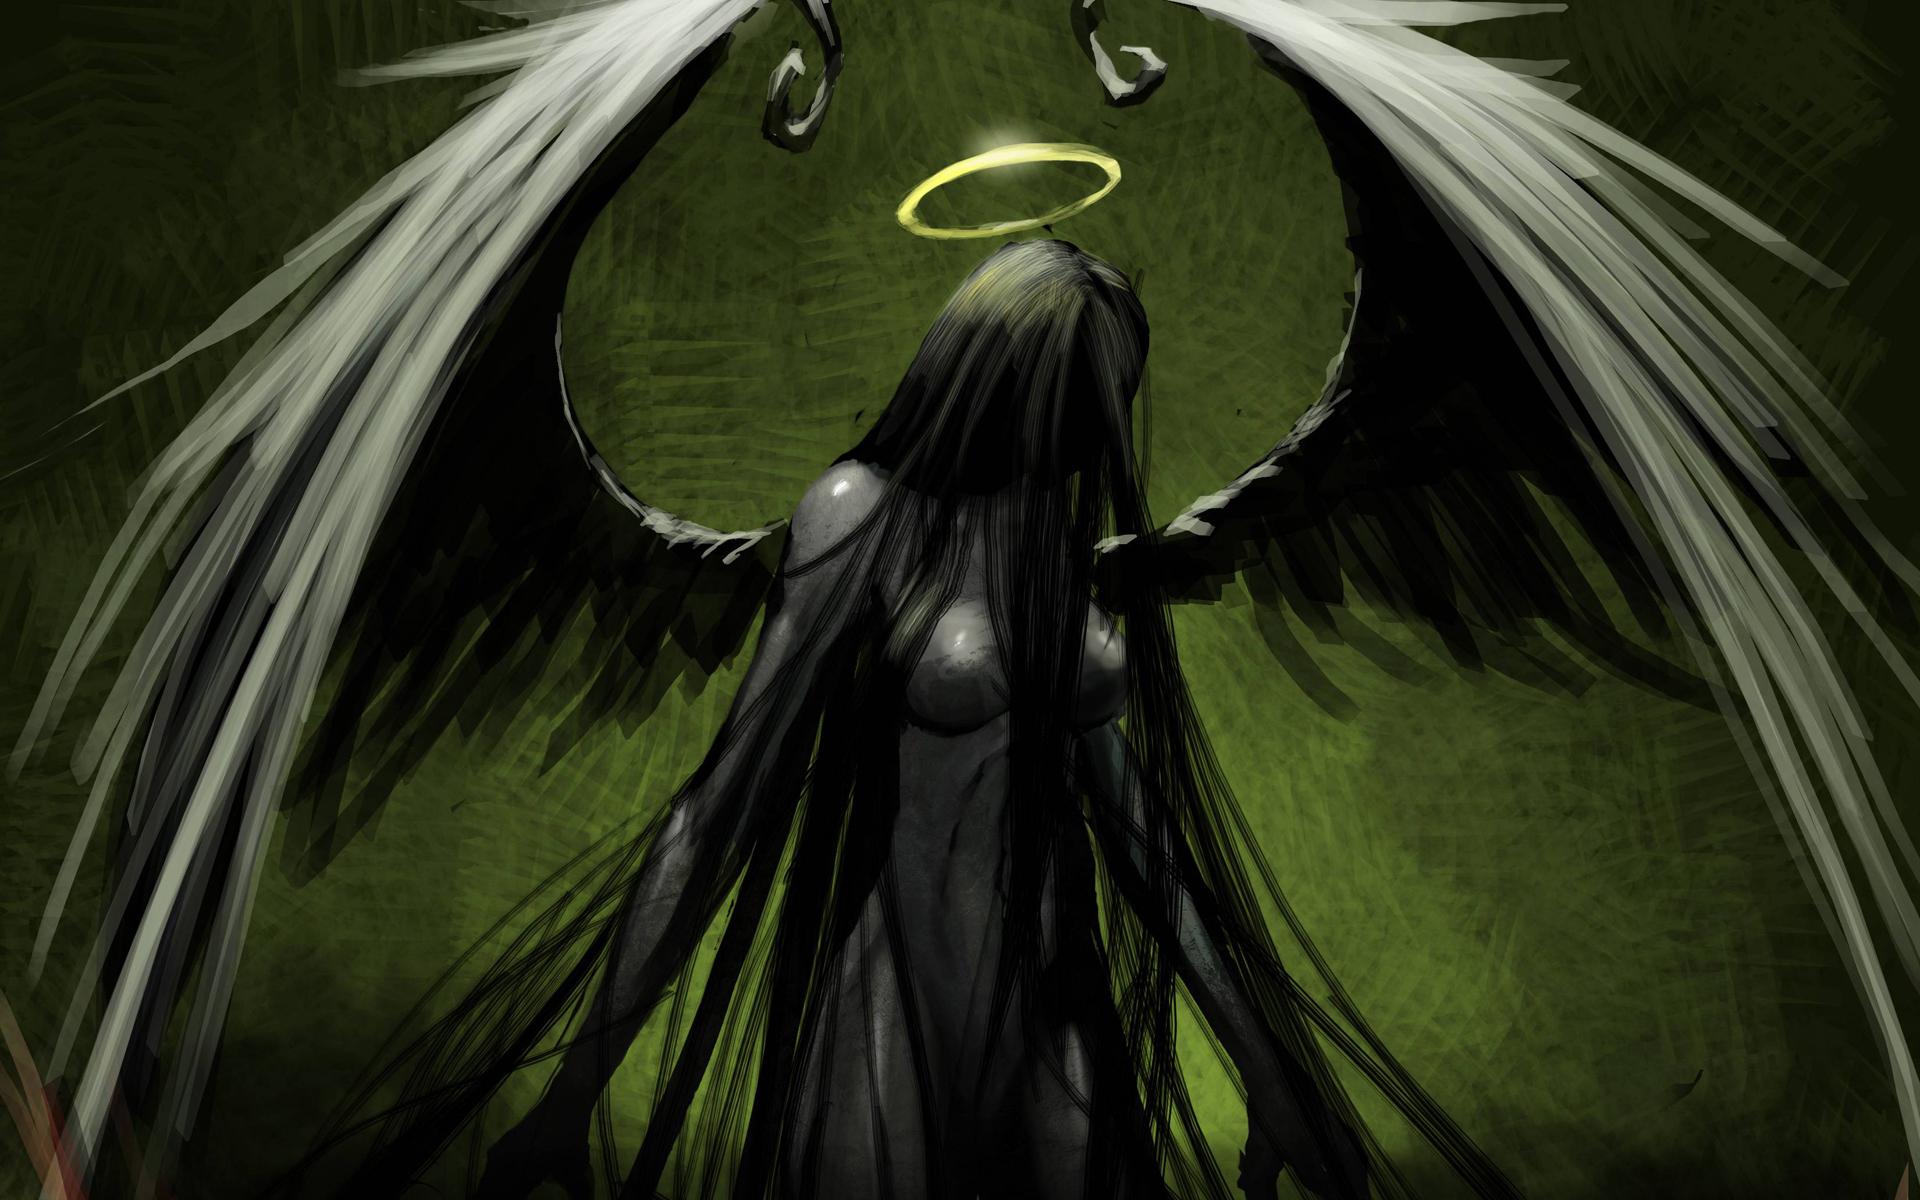 1920x1200 Angel Green Drawing Halo Wings Gothic Dark Wallpaper 1920x1200